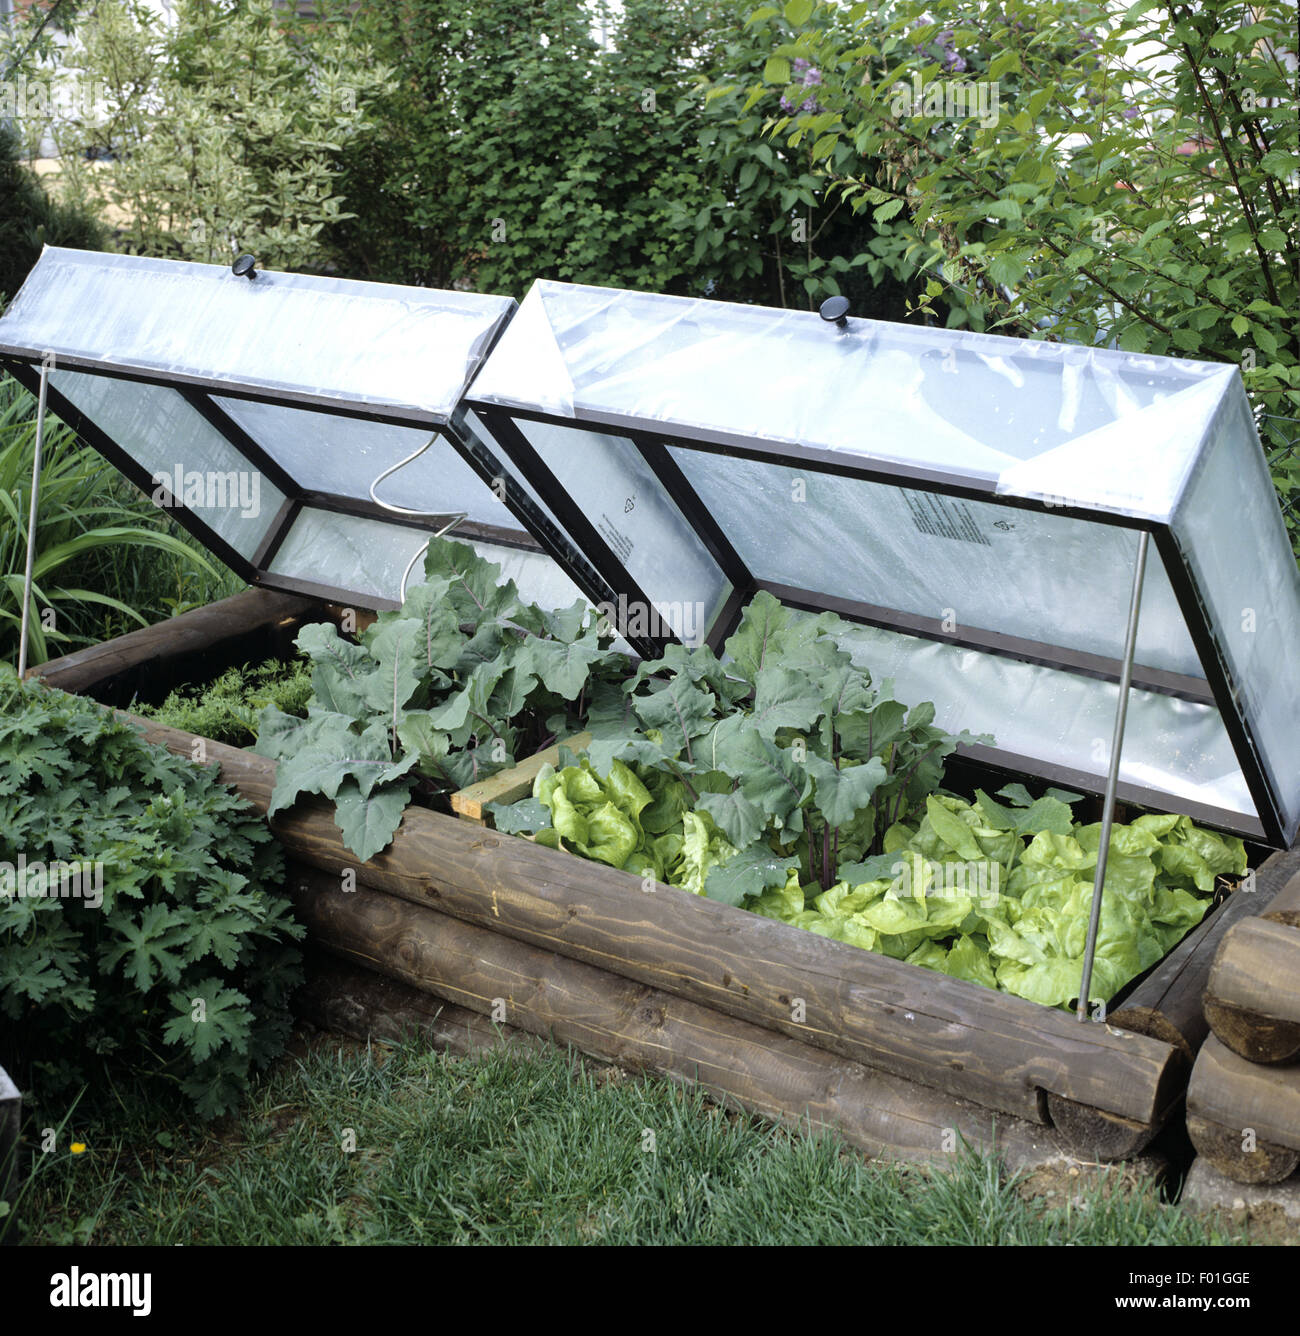 Fruehbeet, Garten, Salat, Kohlrabi, Folie, Stock Photo